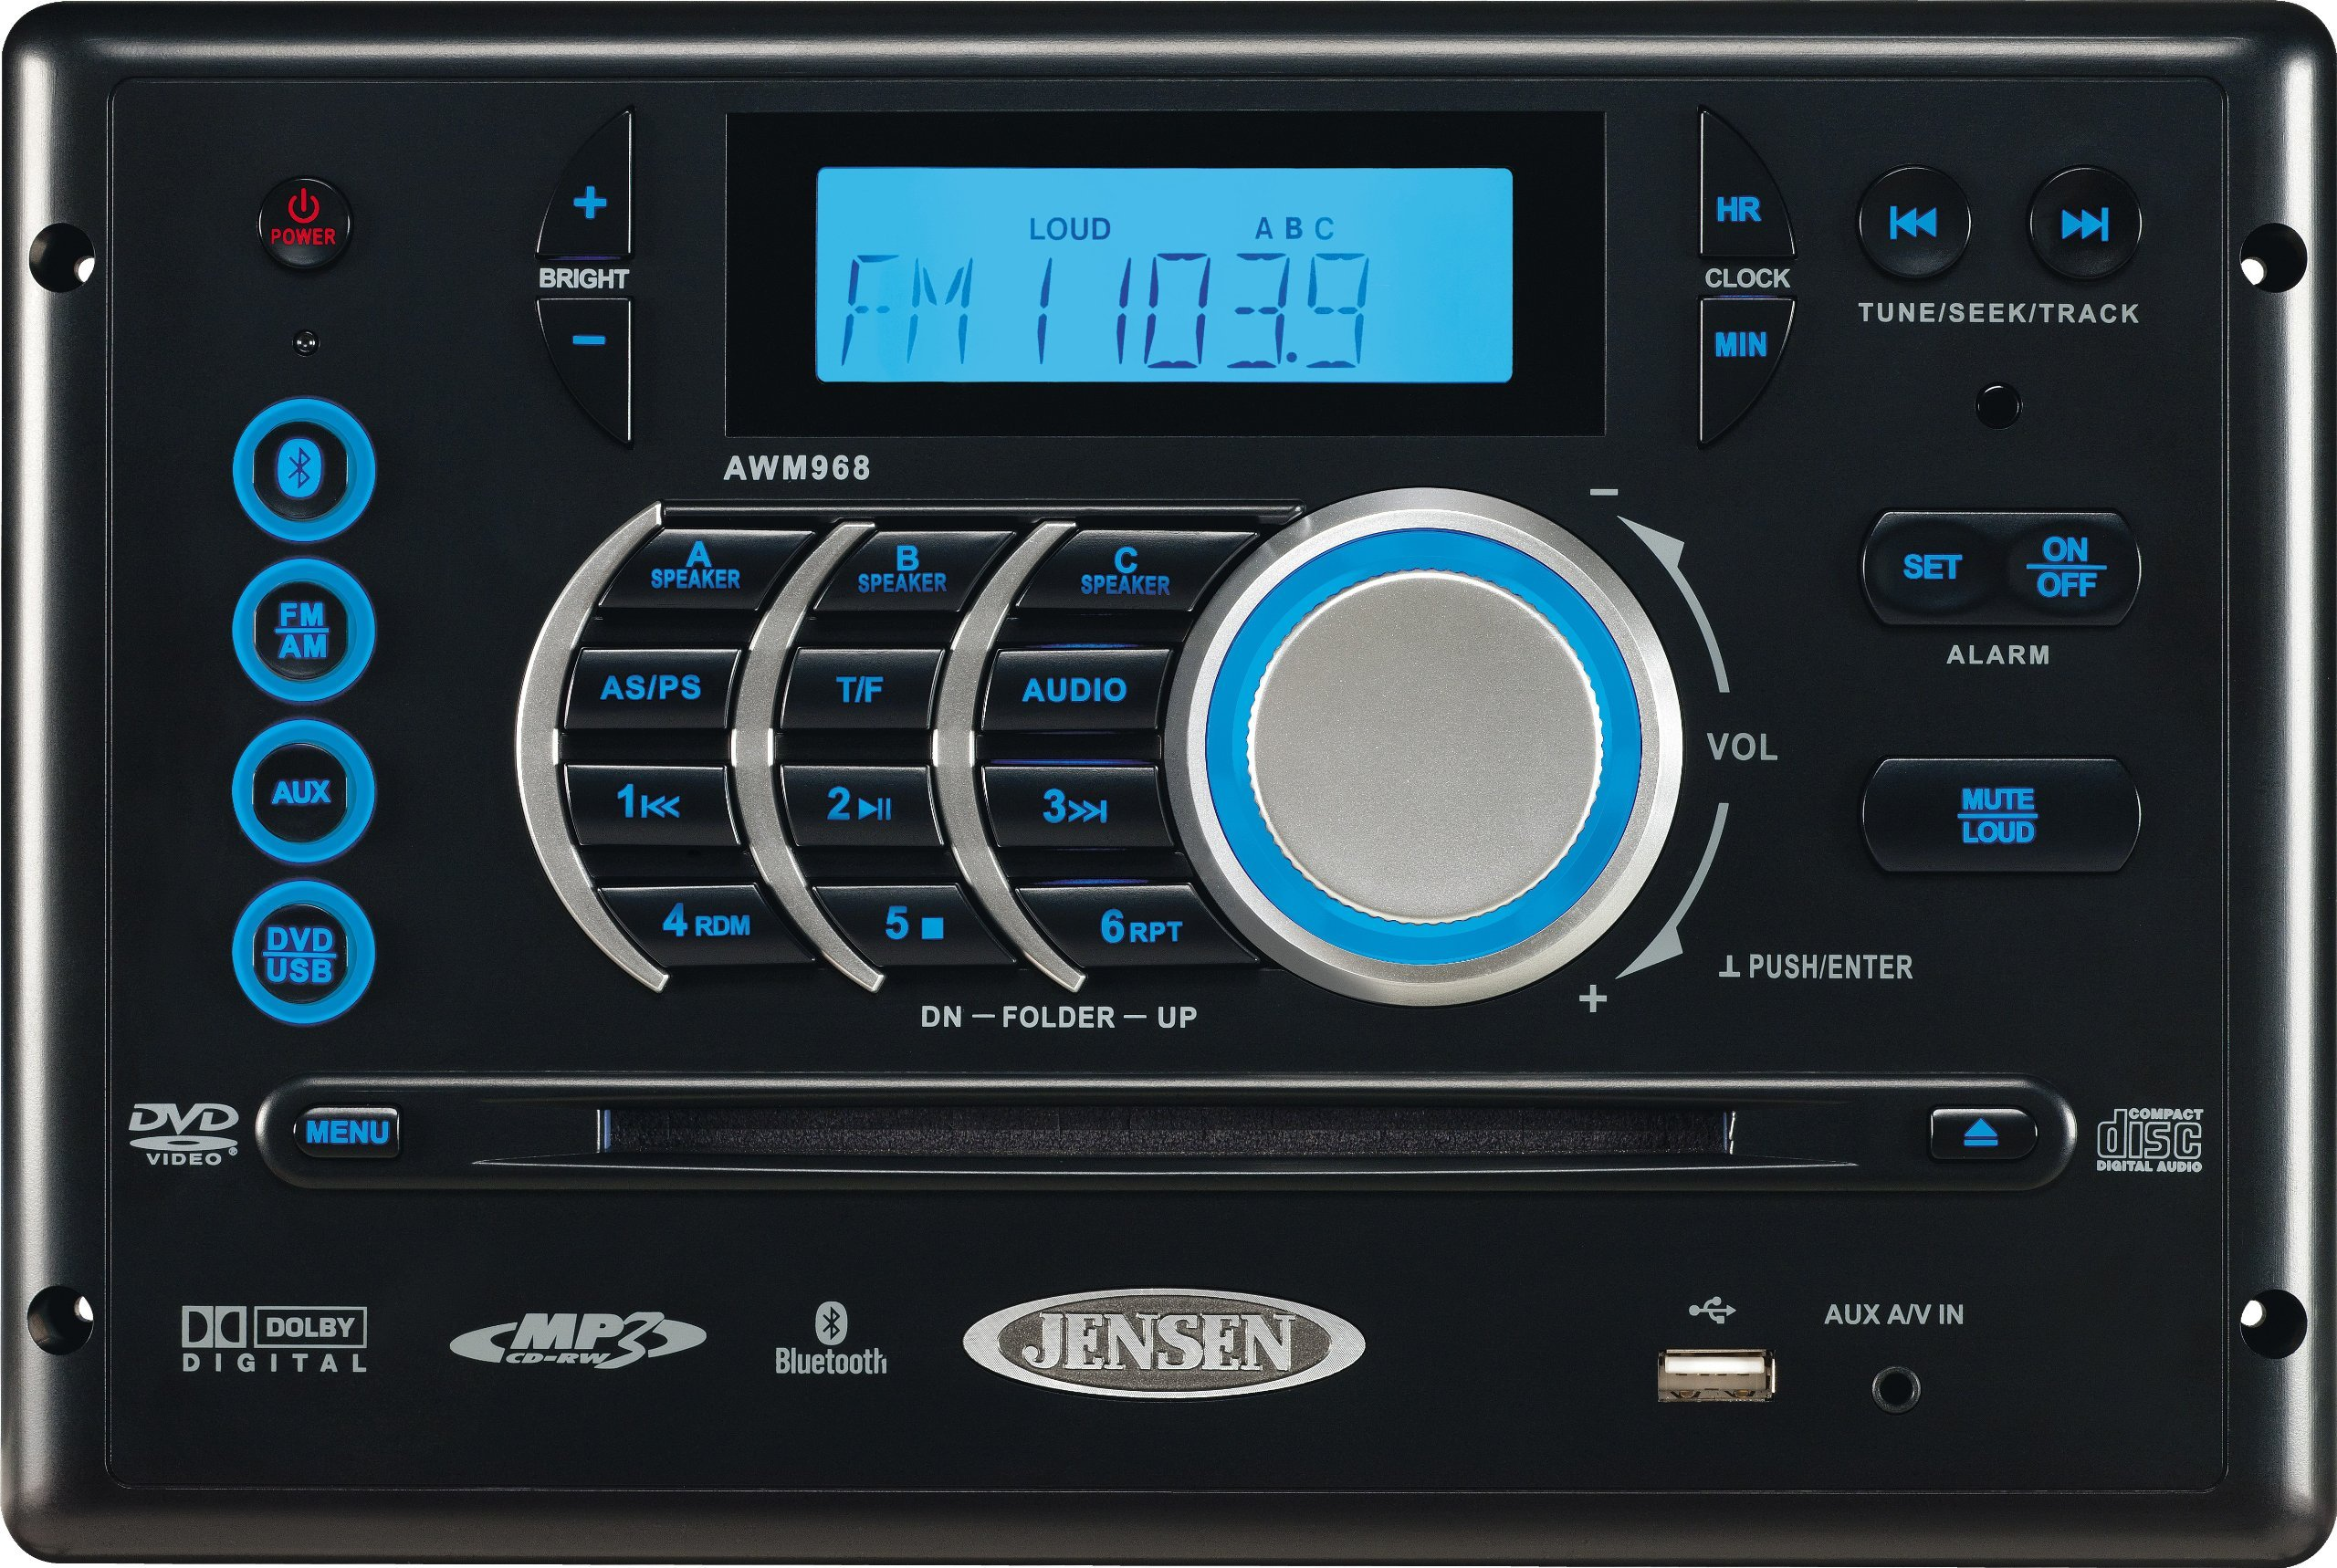 Jensen AWM968 AM/FM Radio by Jensen